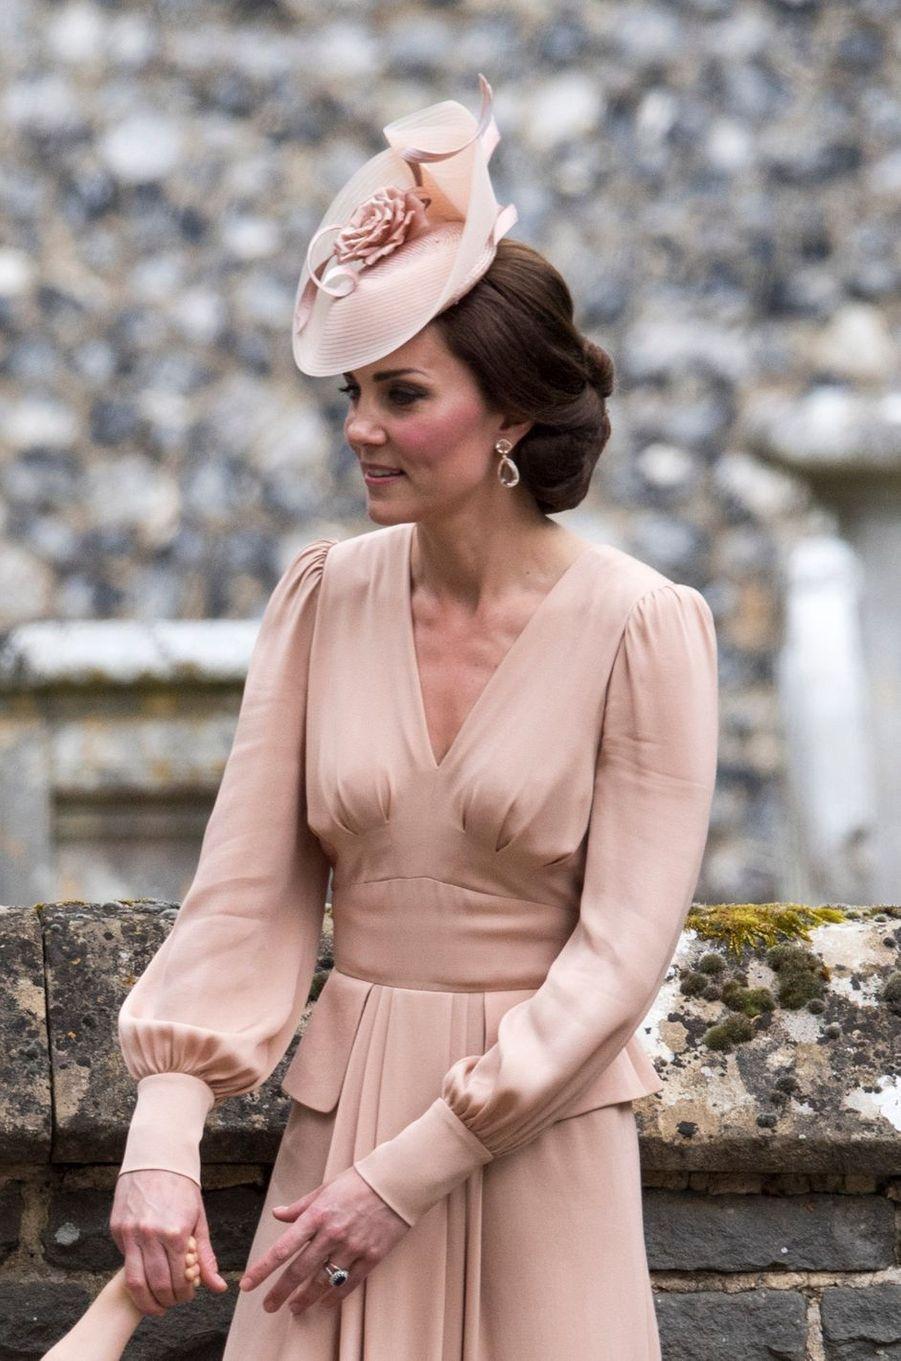 La duchesse Catherine de Cambridge au mariage de Pippa Middleton à Englefield, le 20 mai 2017